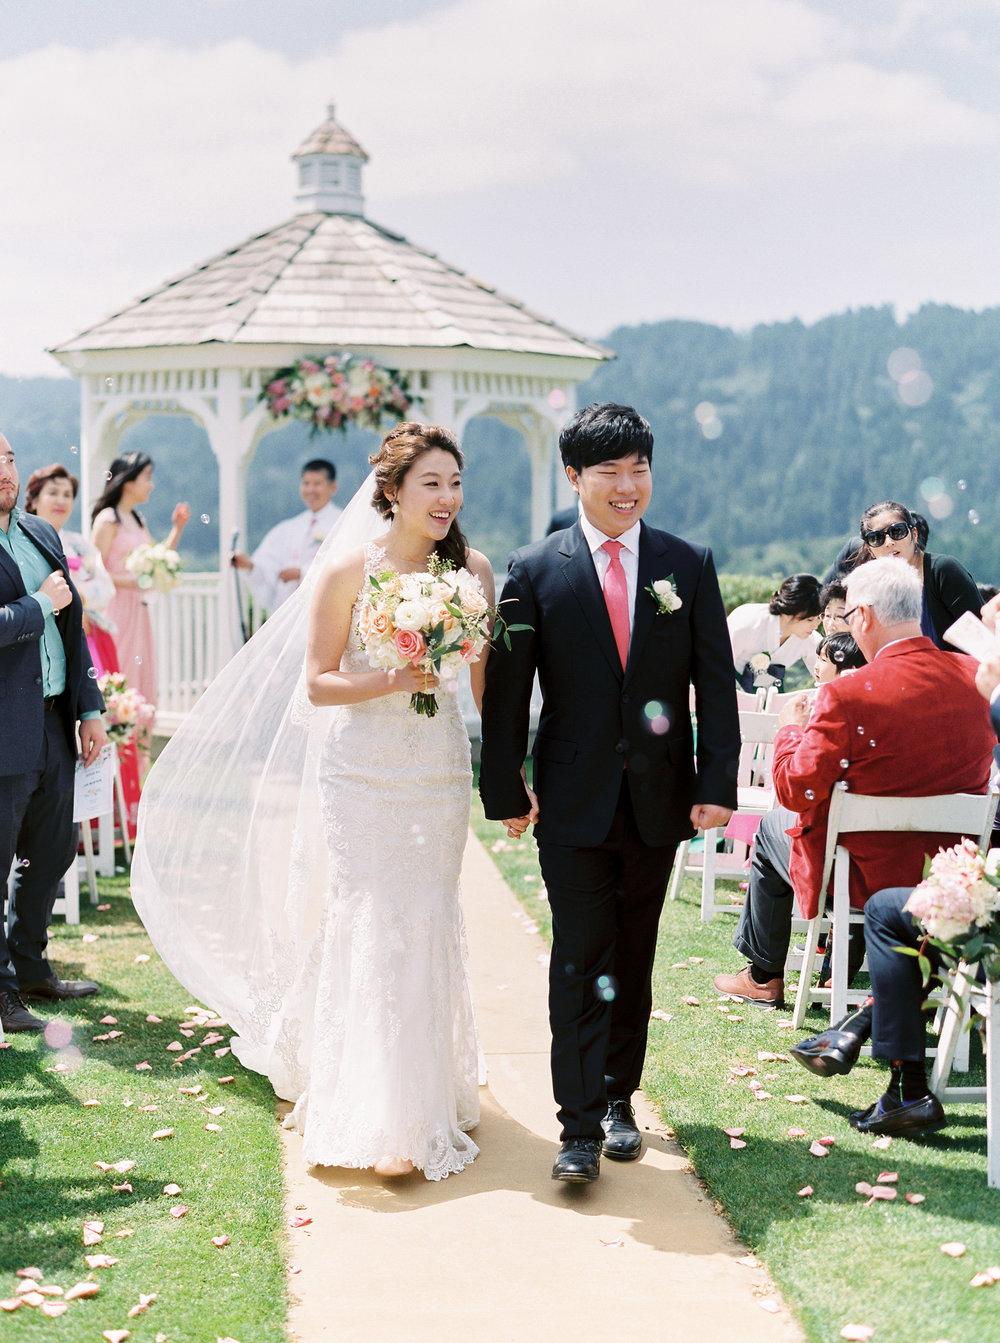 mountaintop-wedding-at-crystal-springs-burlingame-california-53.jpg